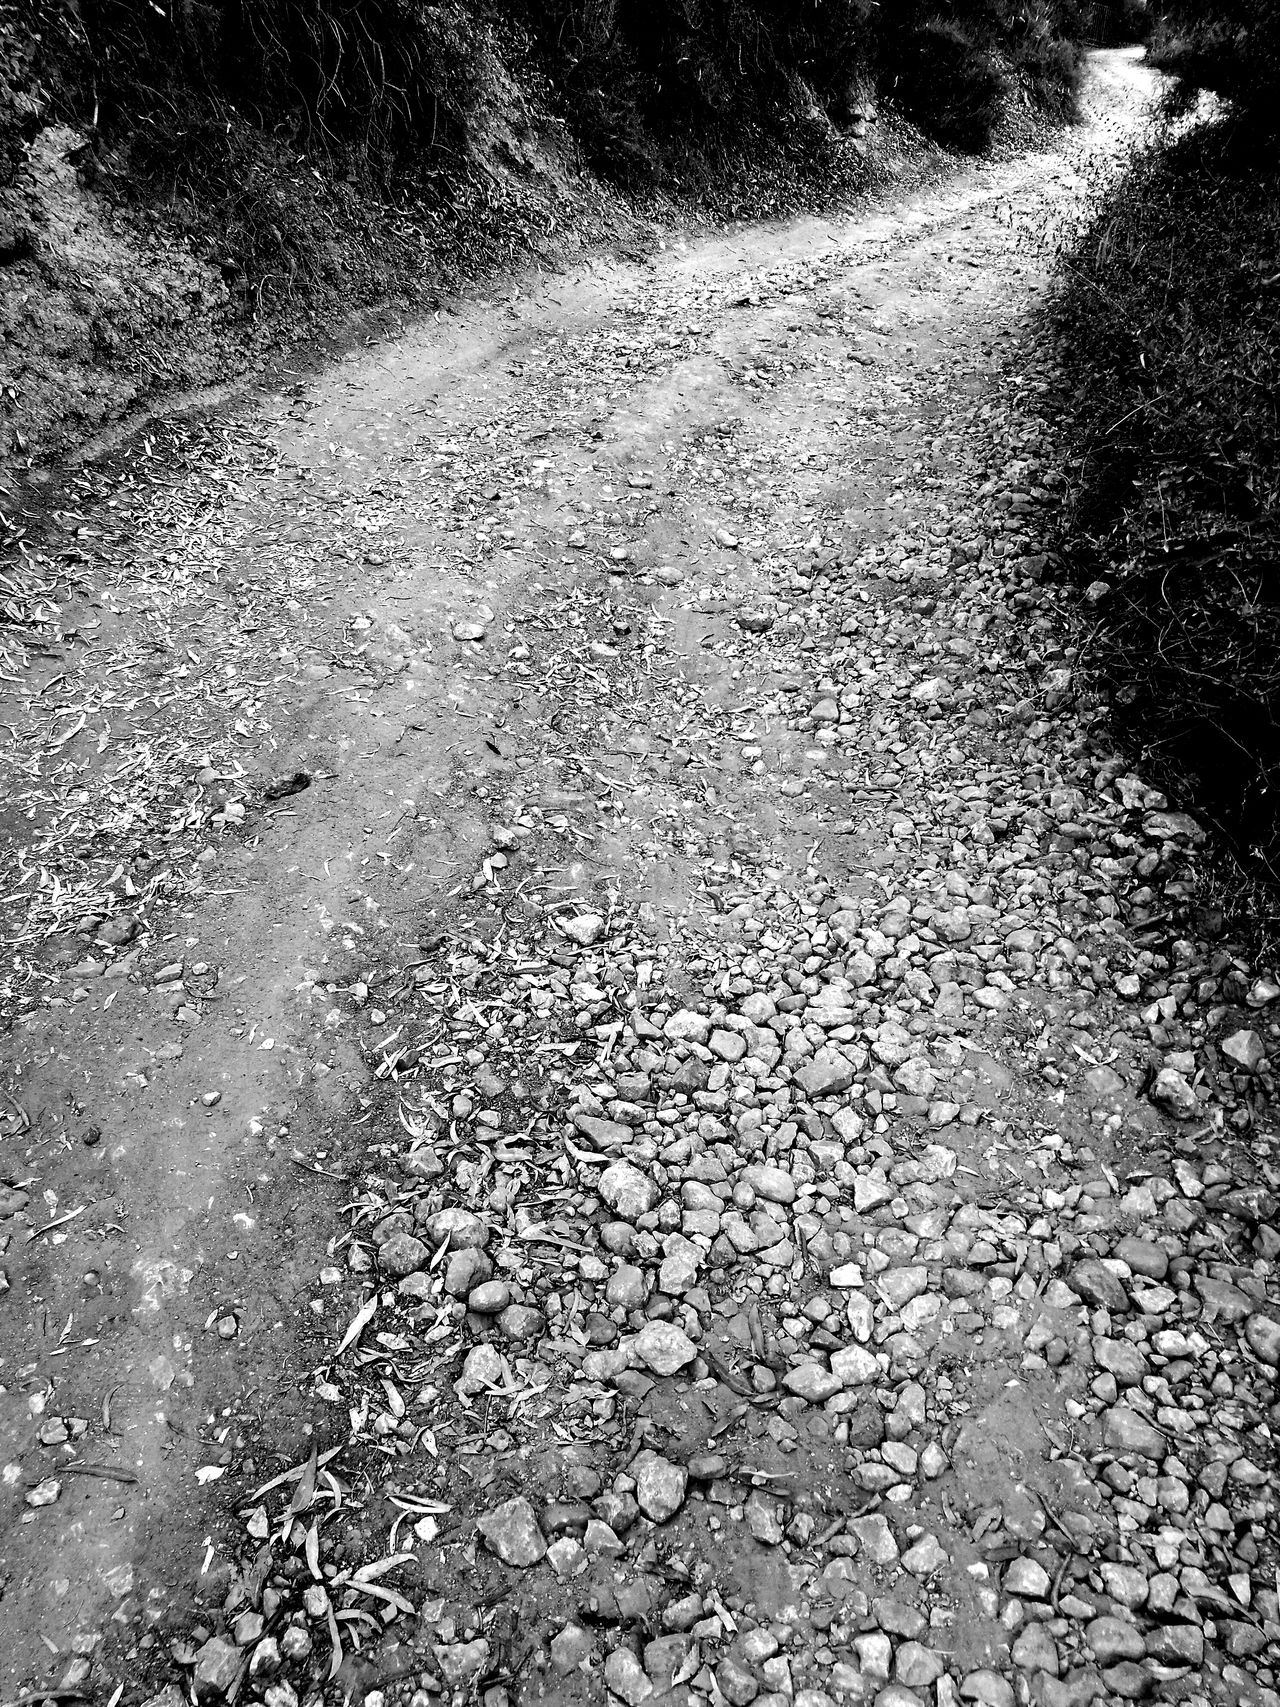 Blackandwhite Sentiero nei Giardini Kolymbetra Nature. Path in Kolymbetra Gardens Monochrome Photography Monochrome Monochrome Photograhy Welcome To Black